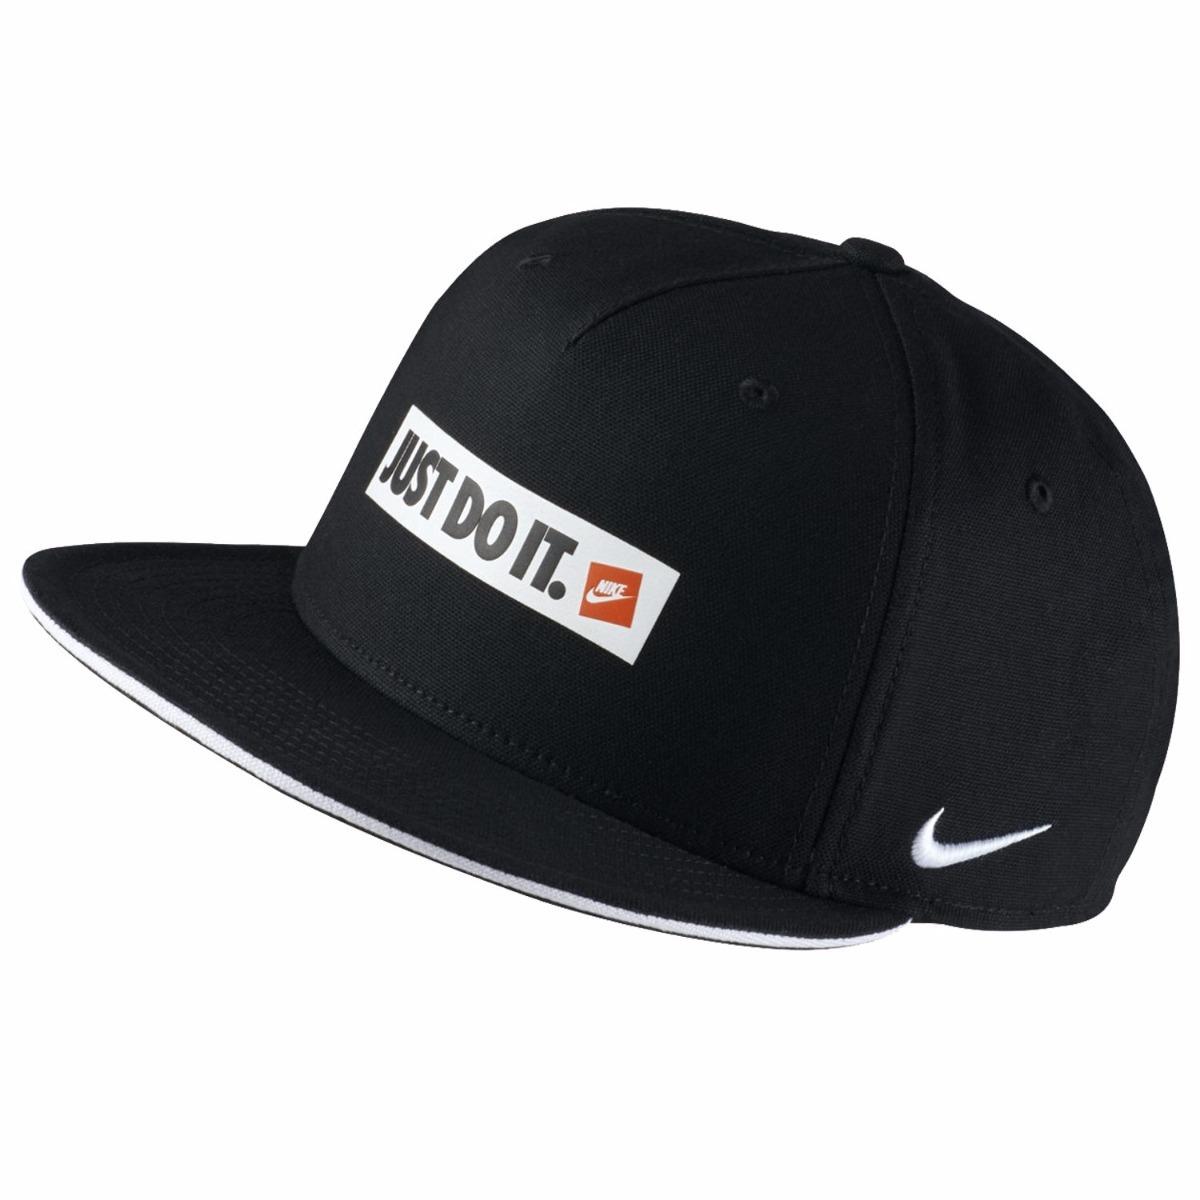 Gorra Nike Nsw True Red Label Just Do It Nike Sb -   1.280 f35e48debe5